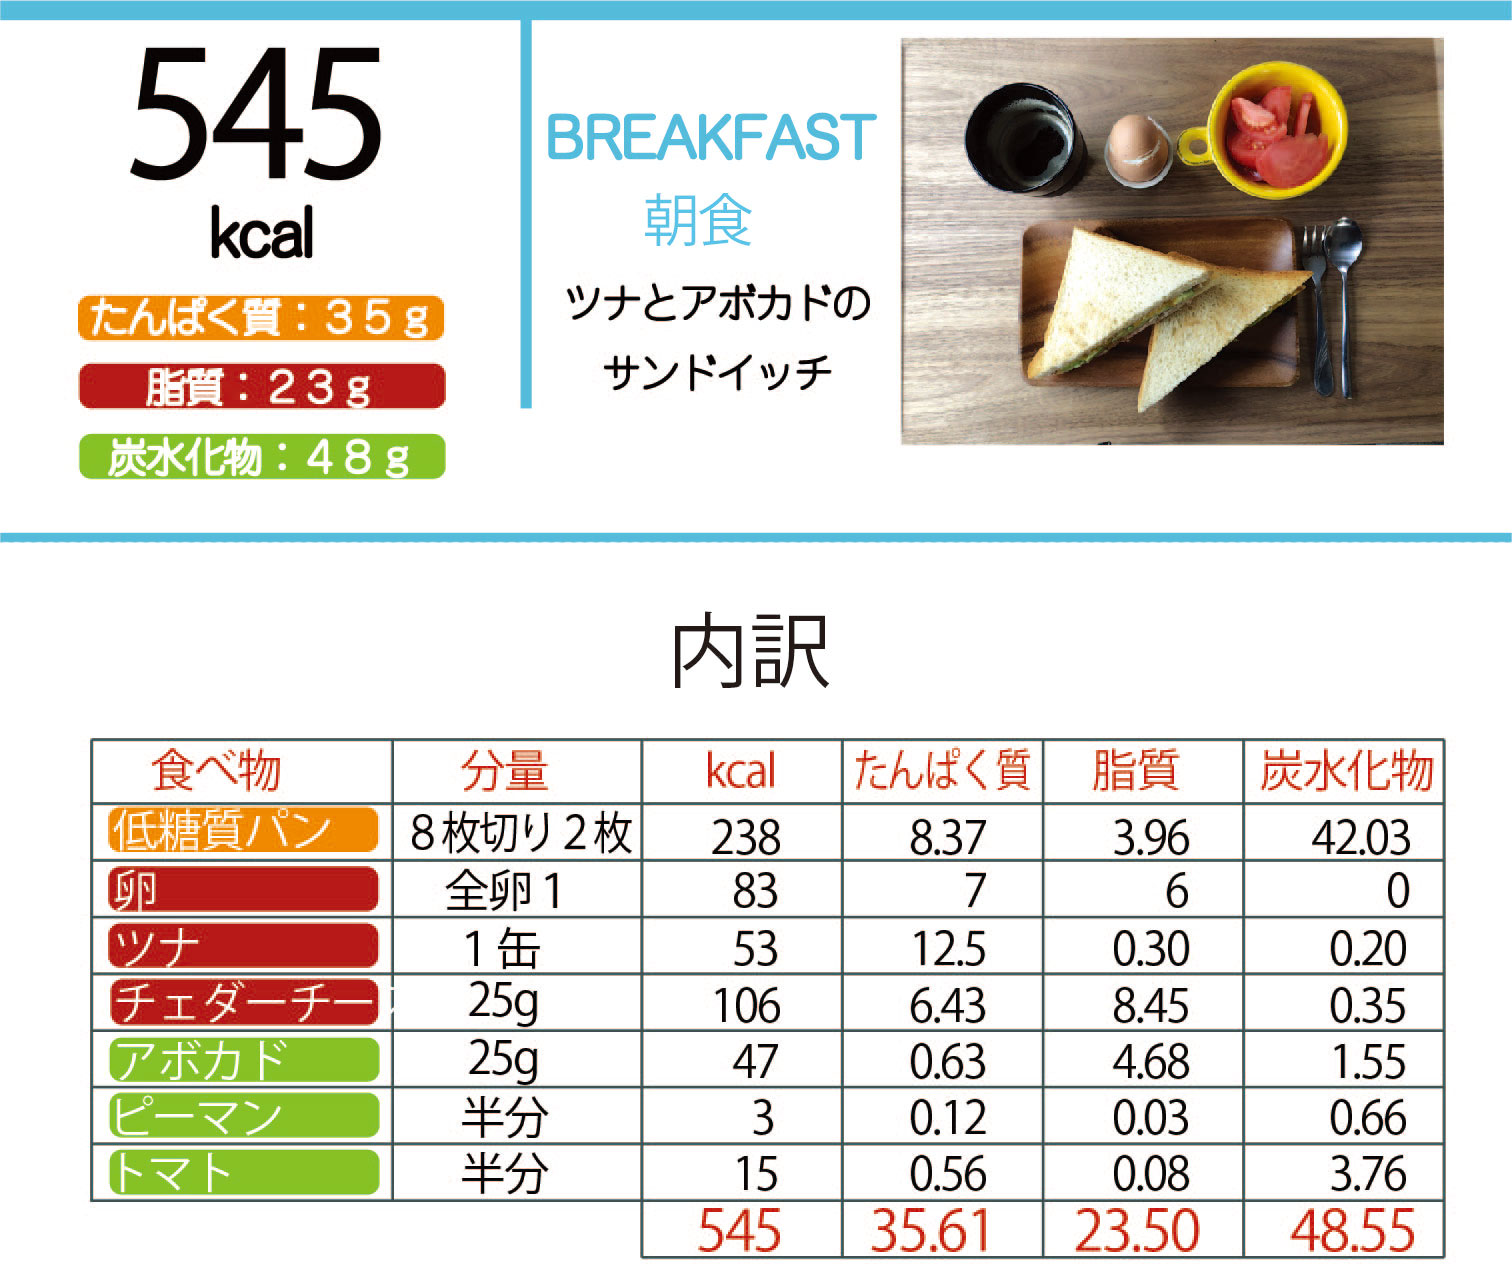 Yoshibreakfast